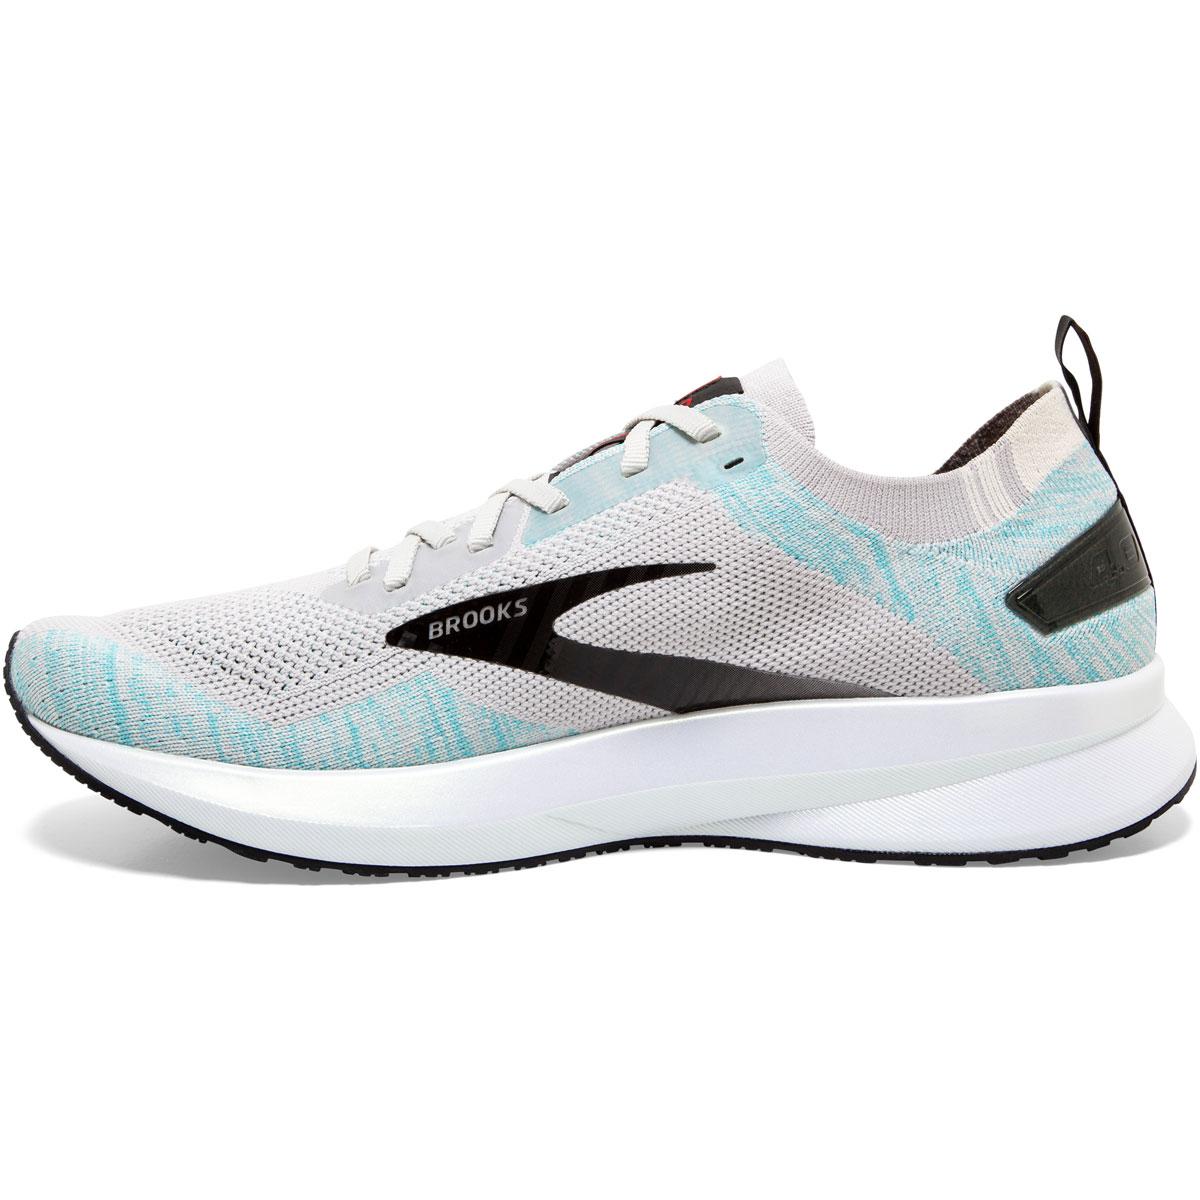 Men's Brooks Levitate 4 Running Shoe - Color: Grey/Black/Capri - Size: 8 - Width: Regular, Grey/Black/Capri, large, image 3